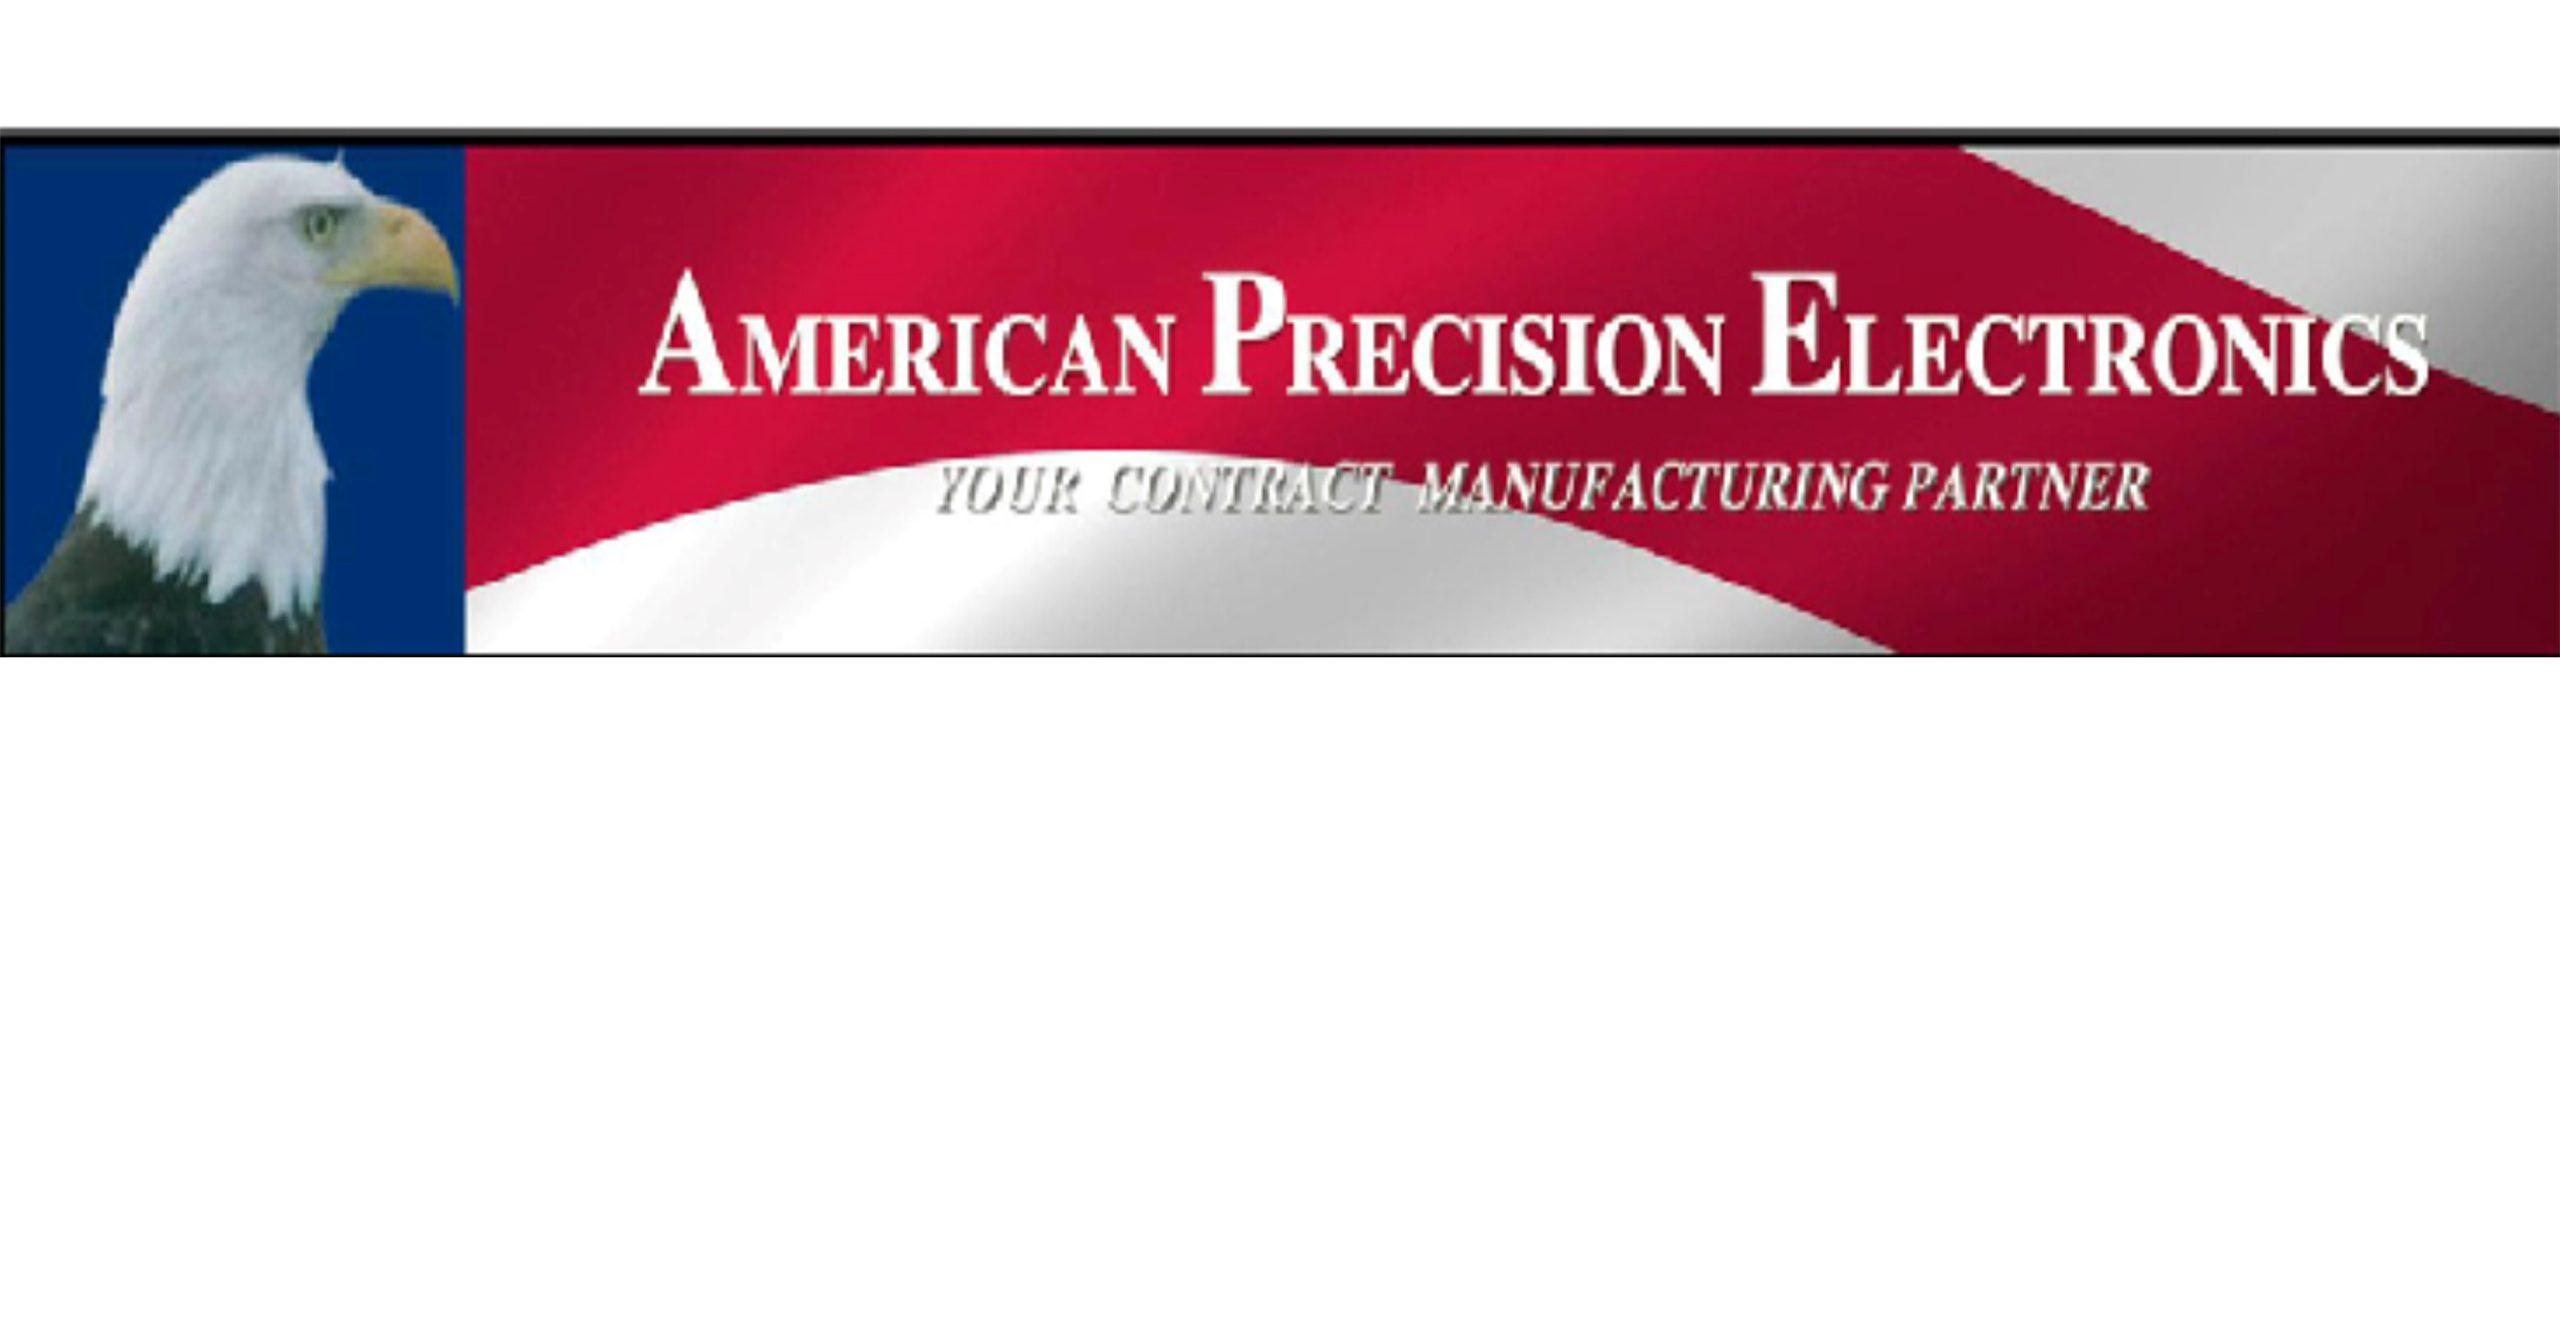 American Precision Electronics logo